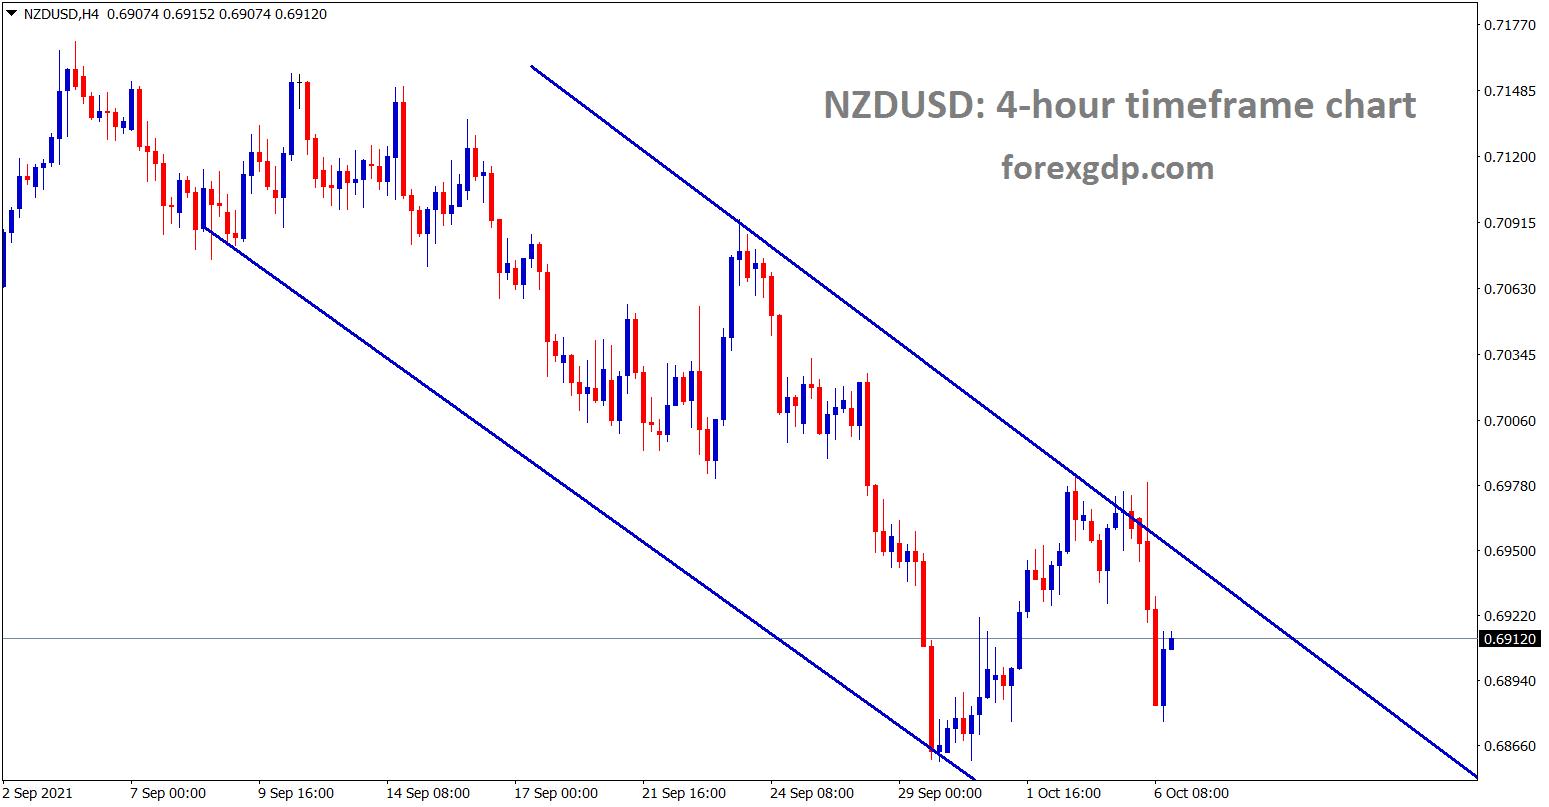 NZDUSD is moving in a minor descending channel range